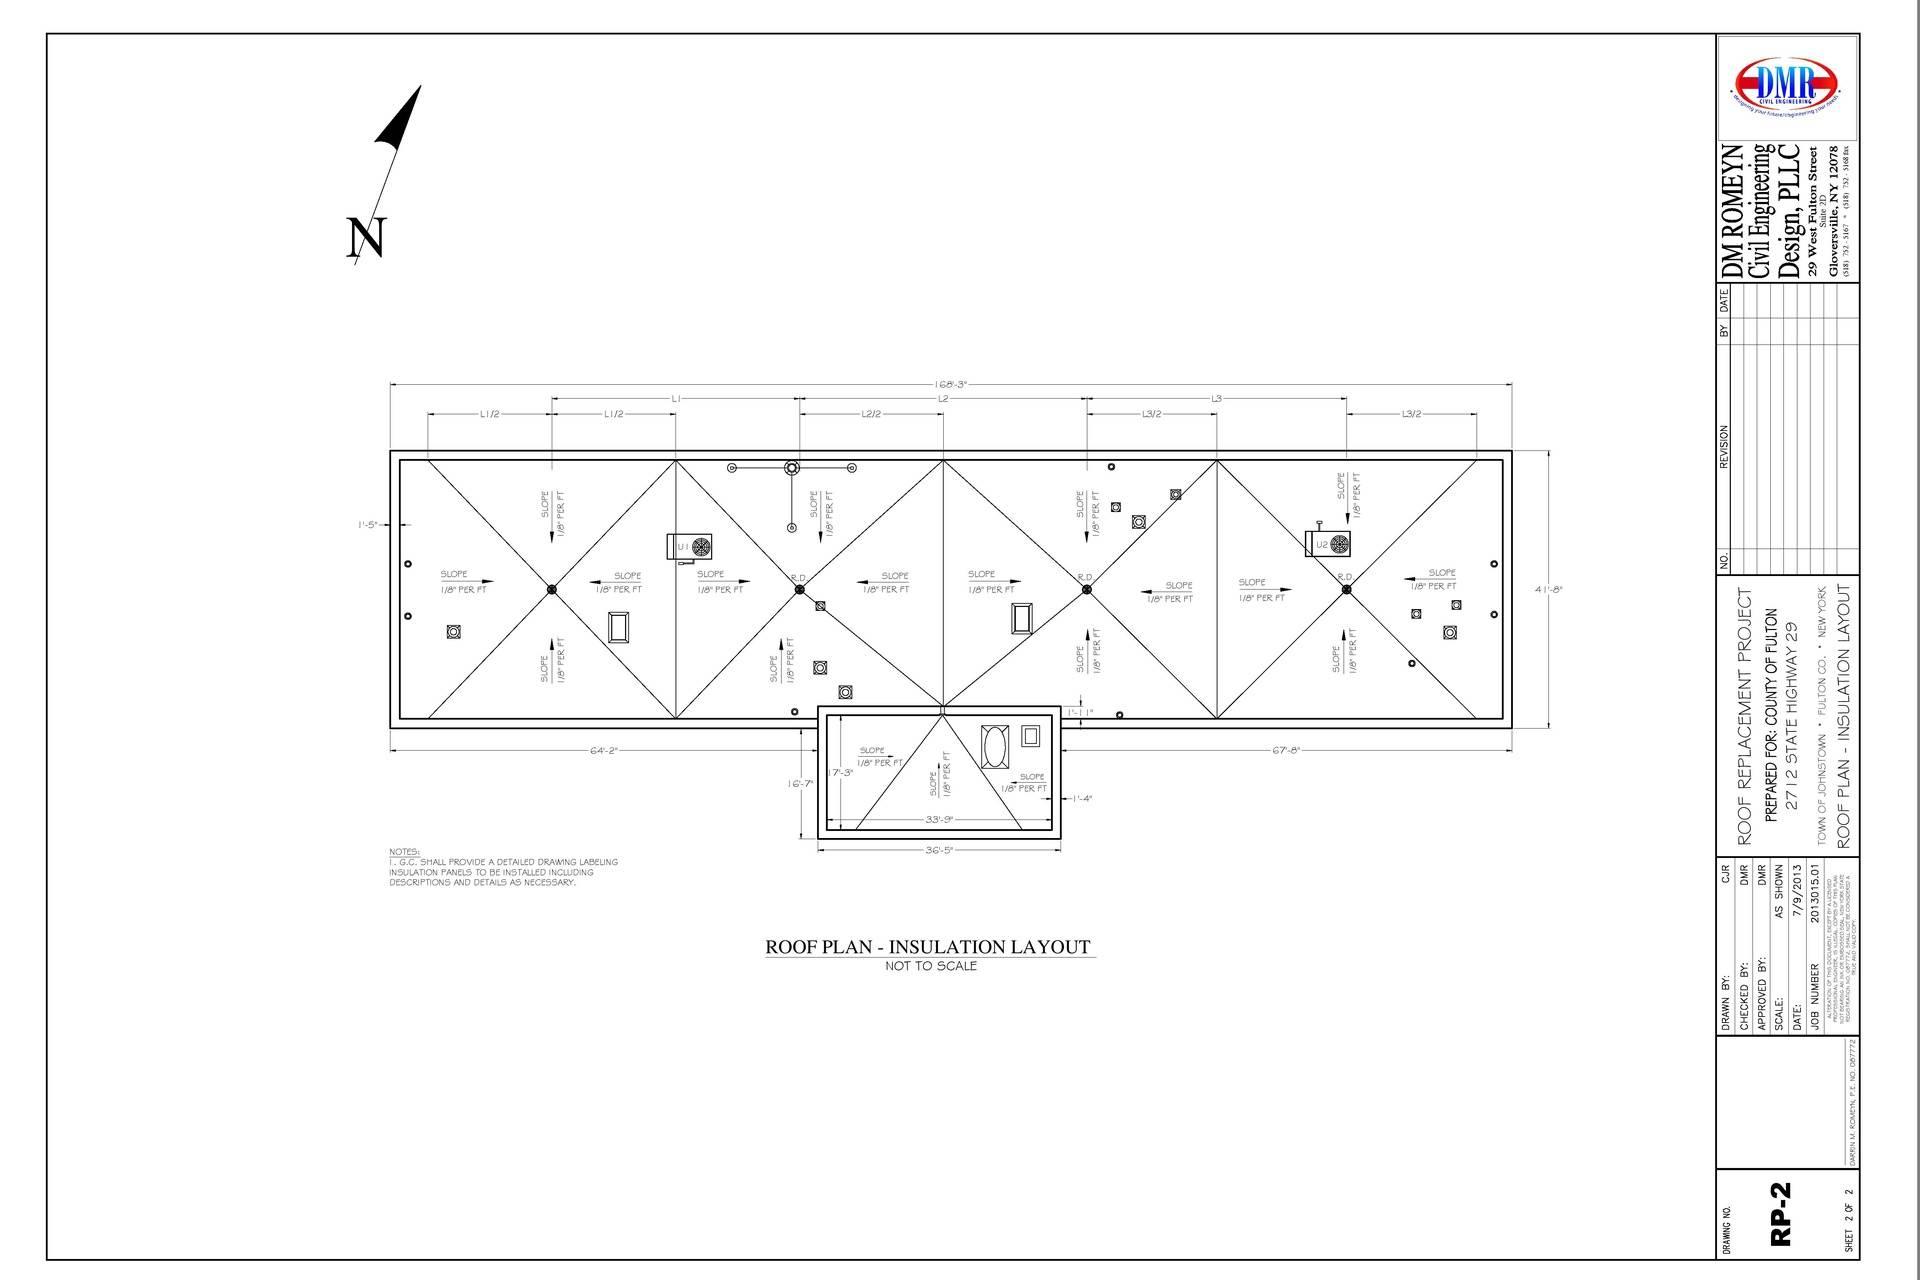 Insulation Layout